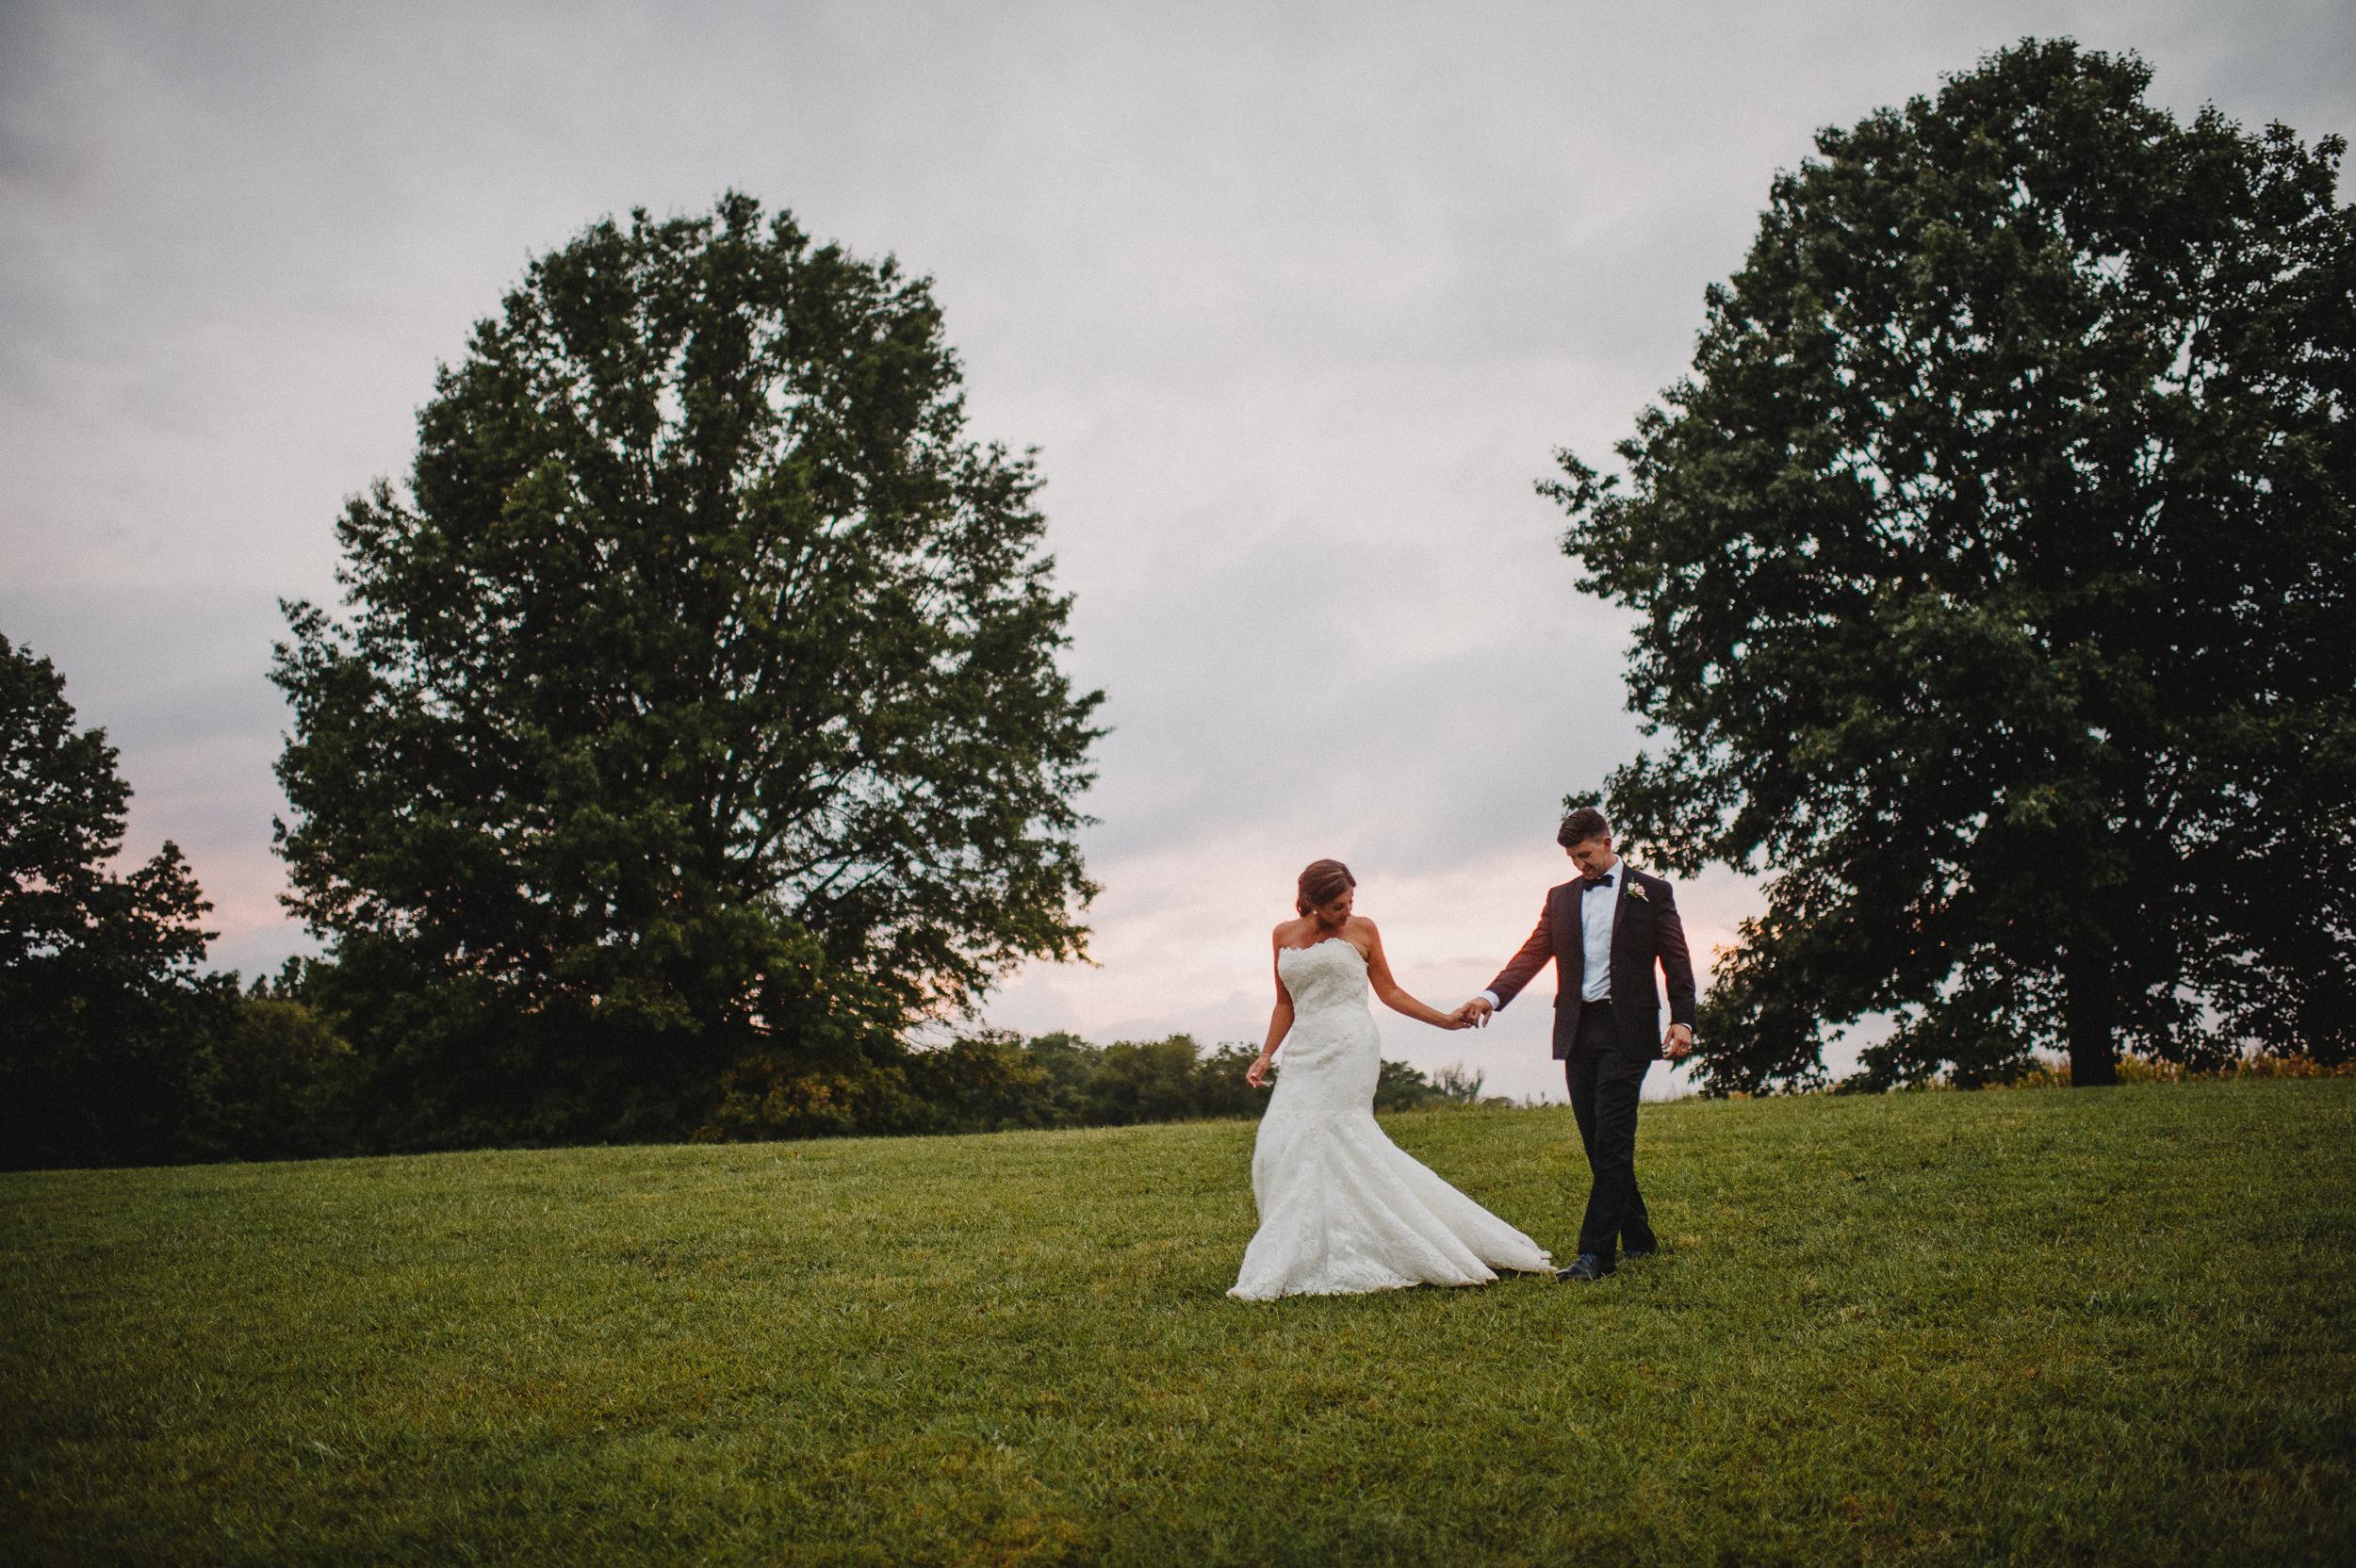 delaware-estate-wedding-photographer-pat-robinson-photography-103.jpg